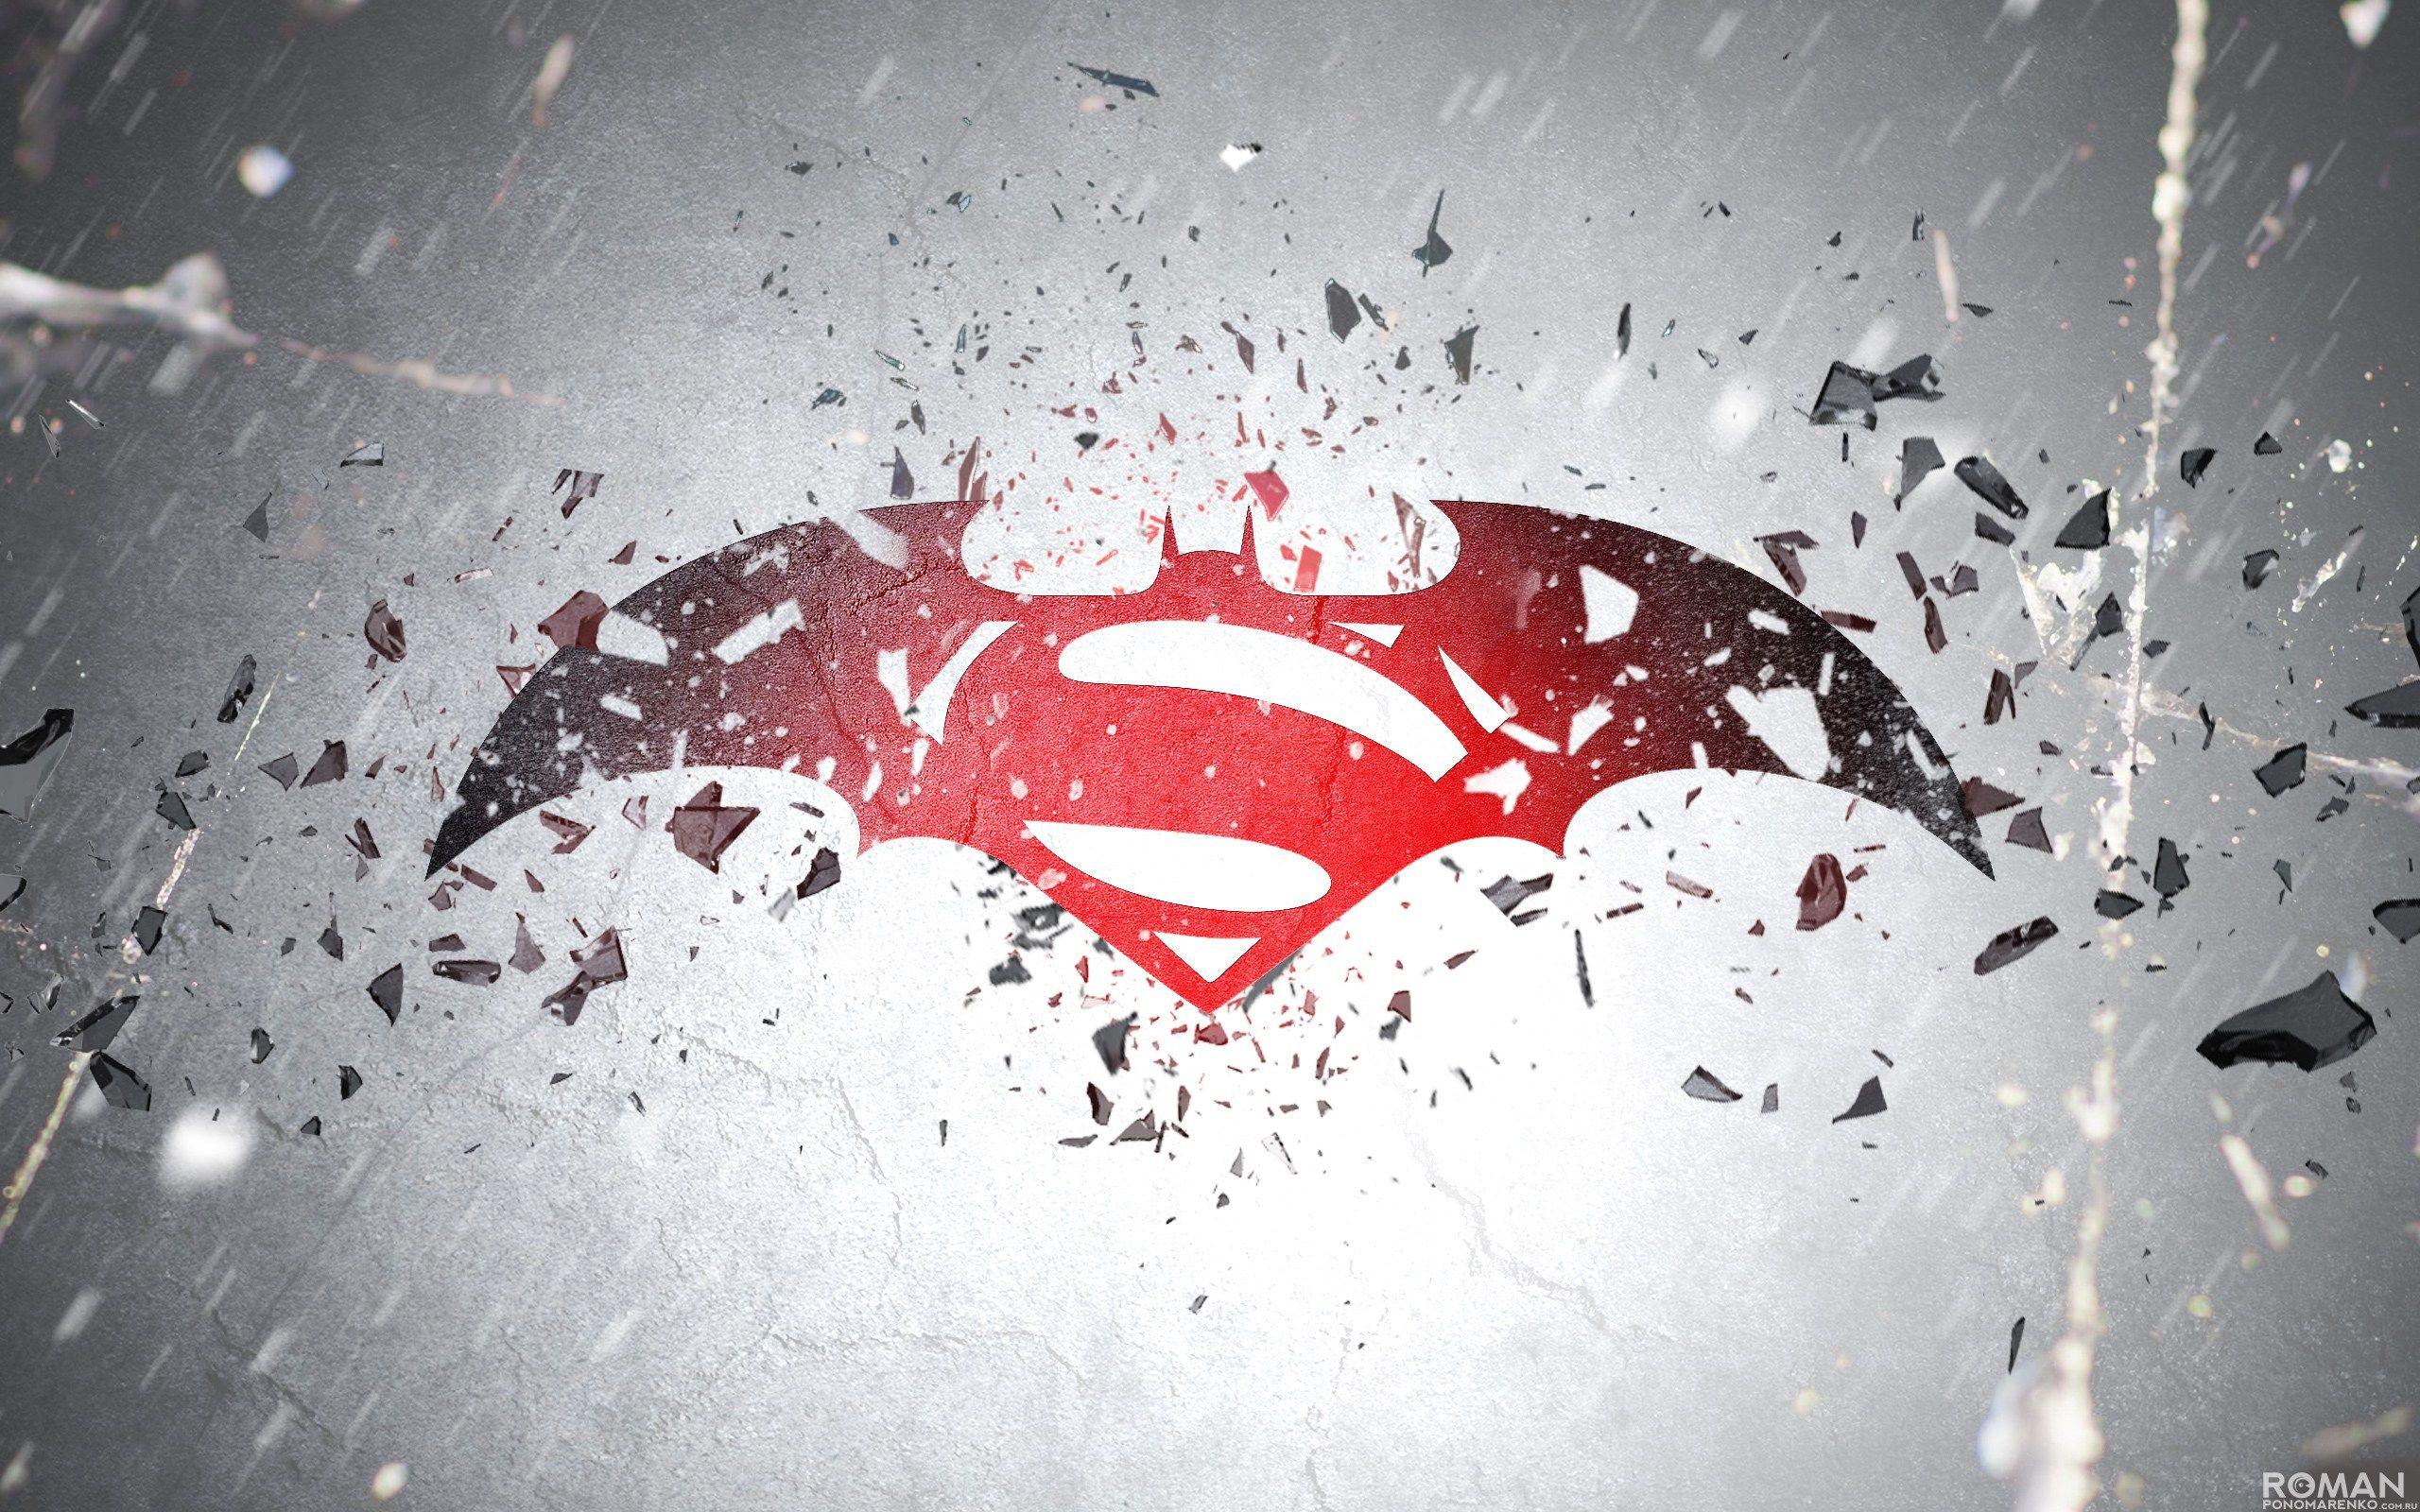 Epic Batman V Superman Fan Trailer Combines All The Trailers In Chronological Order Superman Hd Wallpaper Superman Wallpaper Batman Vs Superman Logo